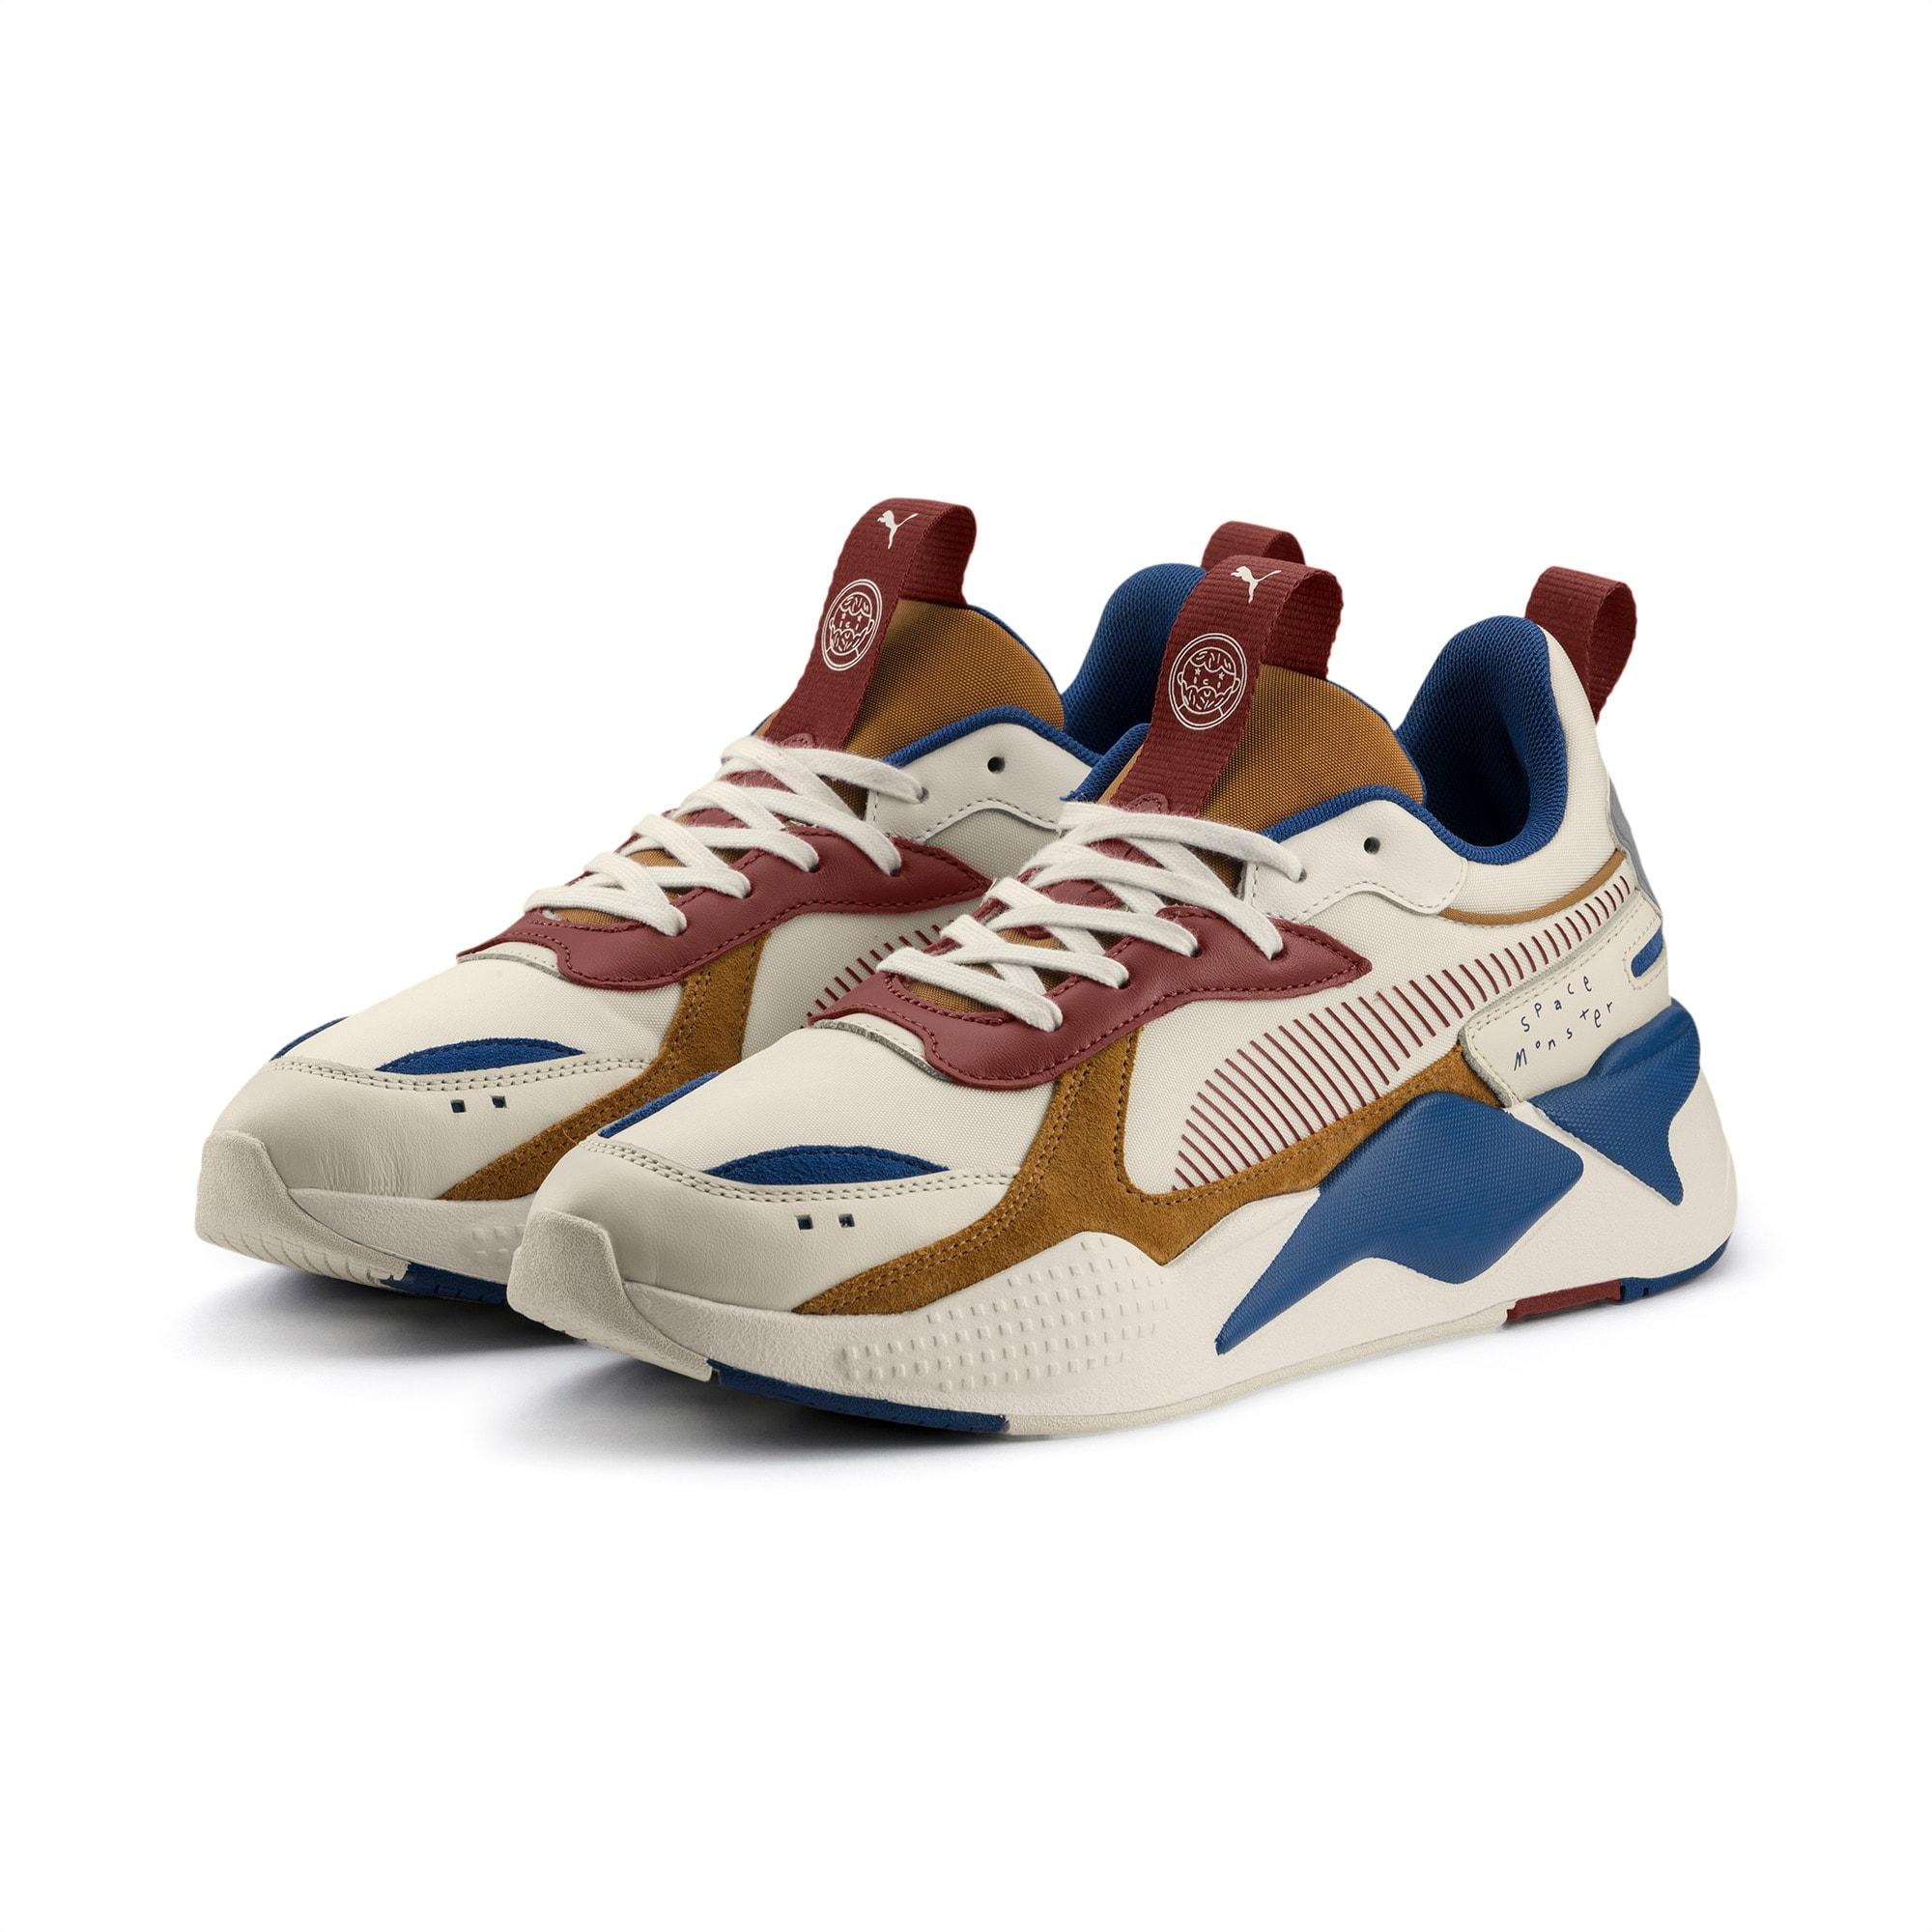 Puma RS X X Tyakasha shoes white blue